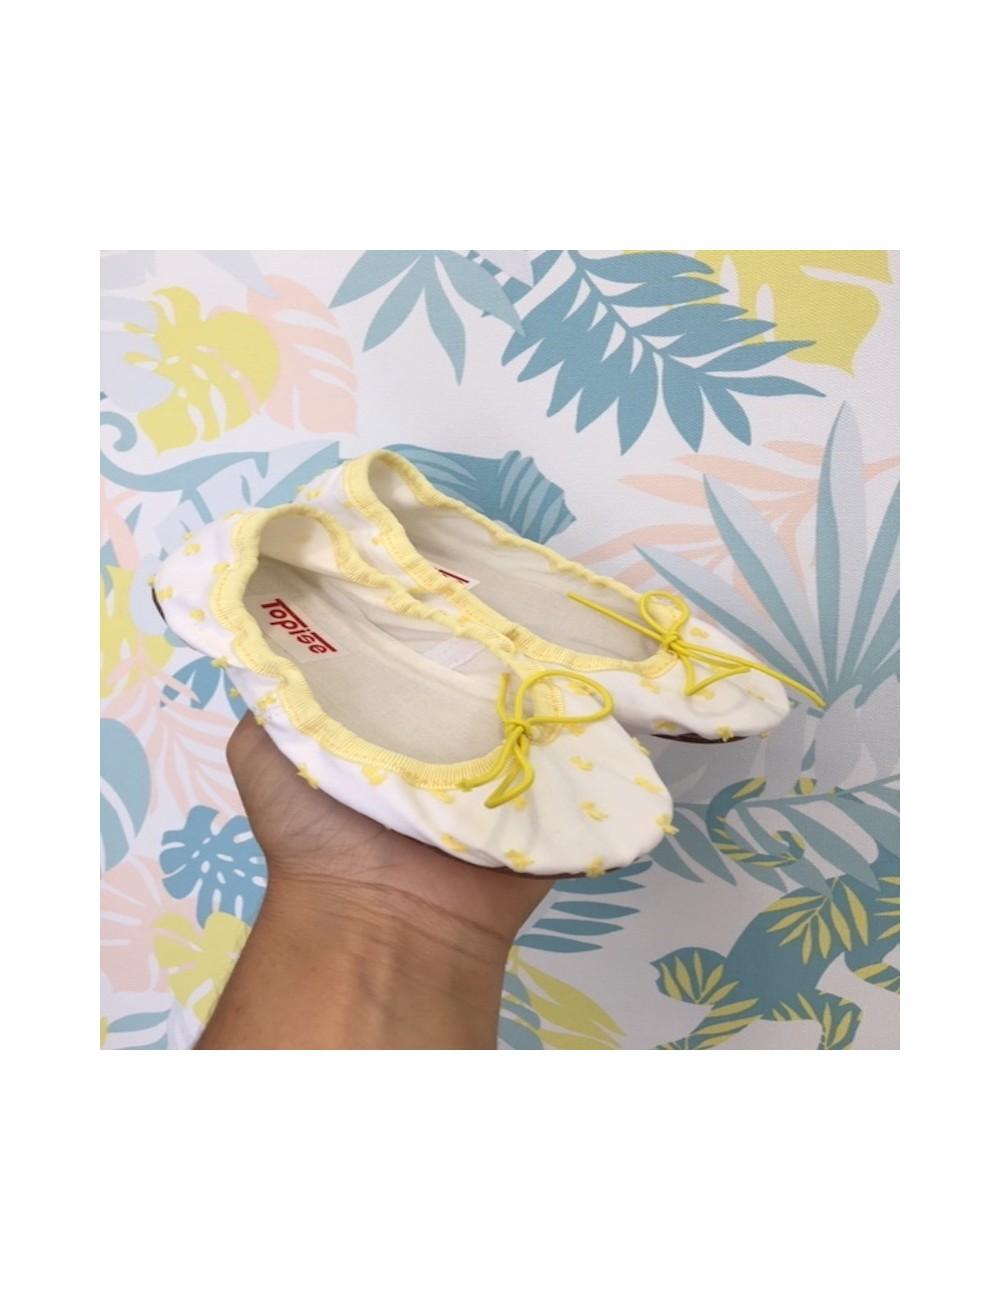 Bailarinas de plumetti amarillo Olivo y Paniculata